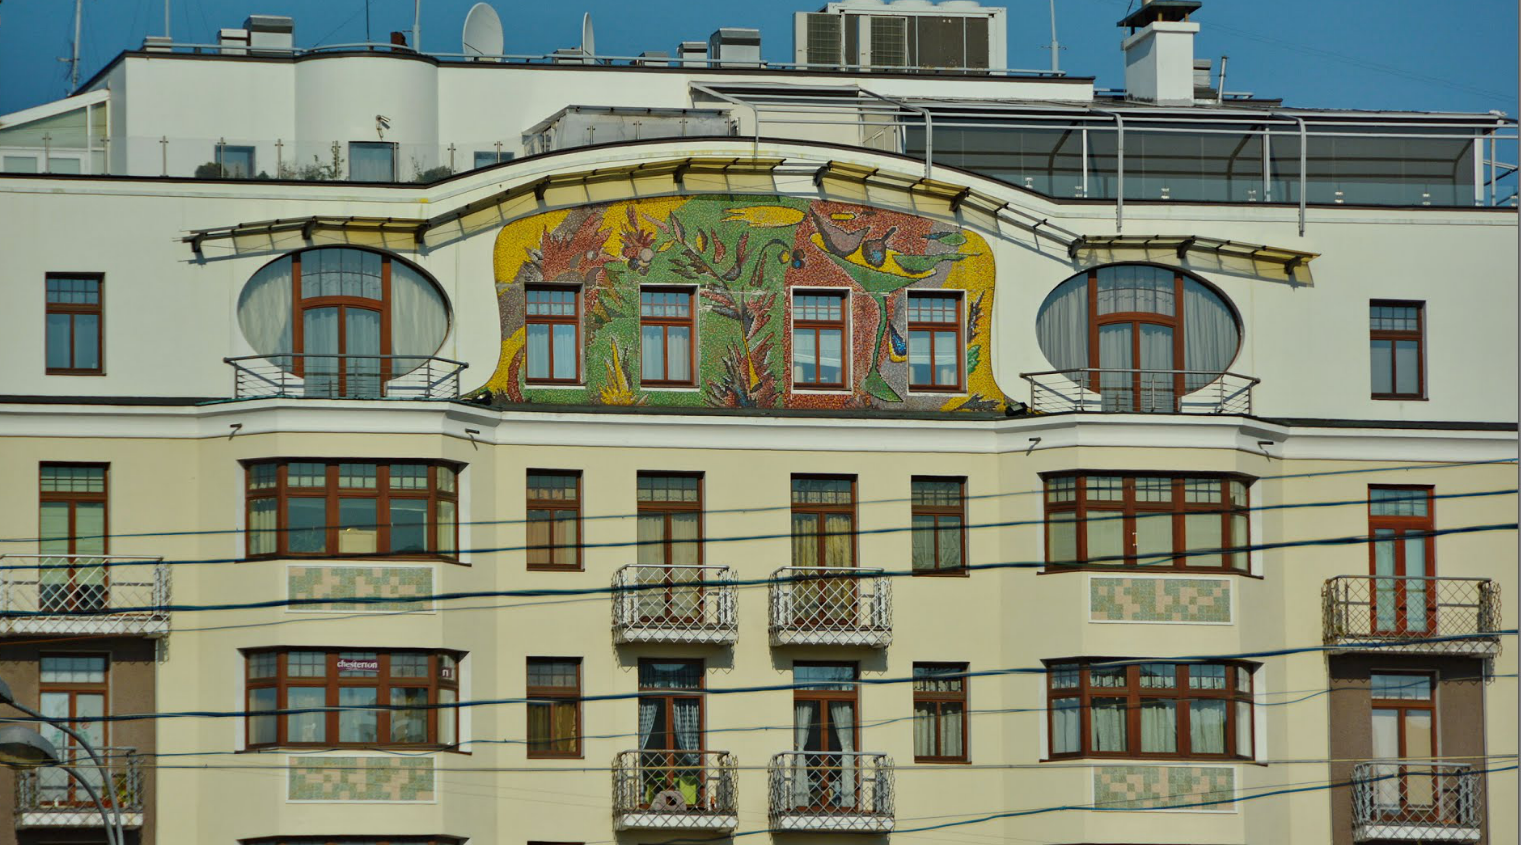 "Stambeni blok ""ВРЕМЕНА ГОДА"", Staromonetni, Moskva, Rusija"